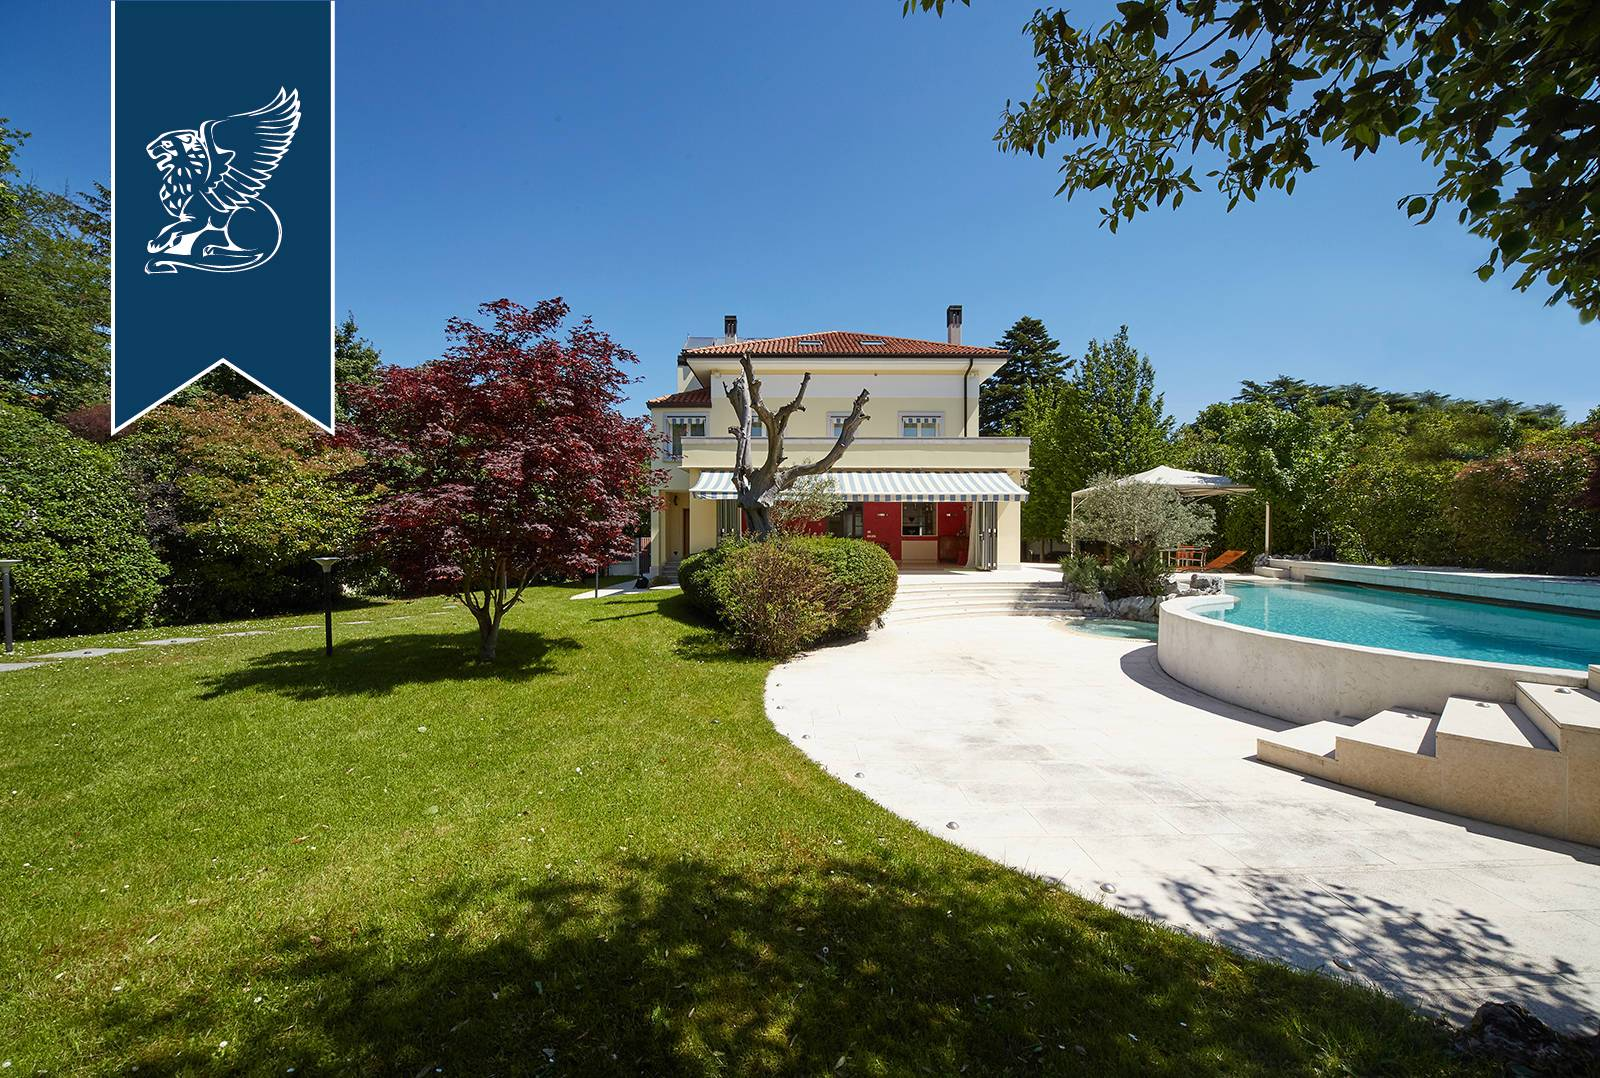 Villa in Vendita a Trieste: 0 locali, 500 mq - Foto 8